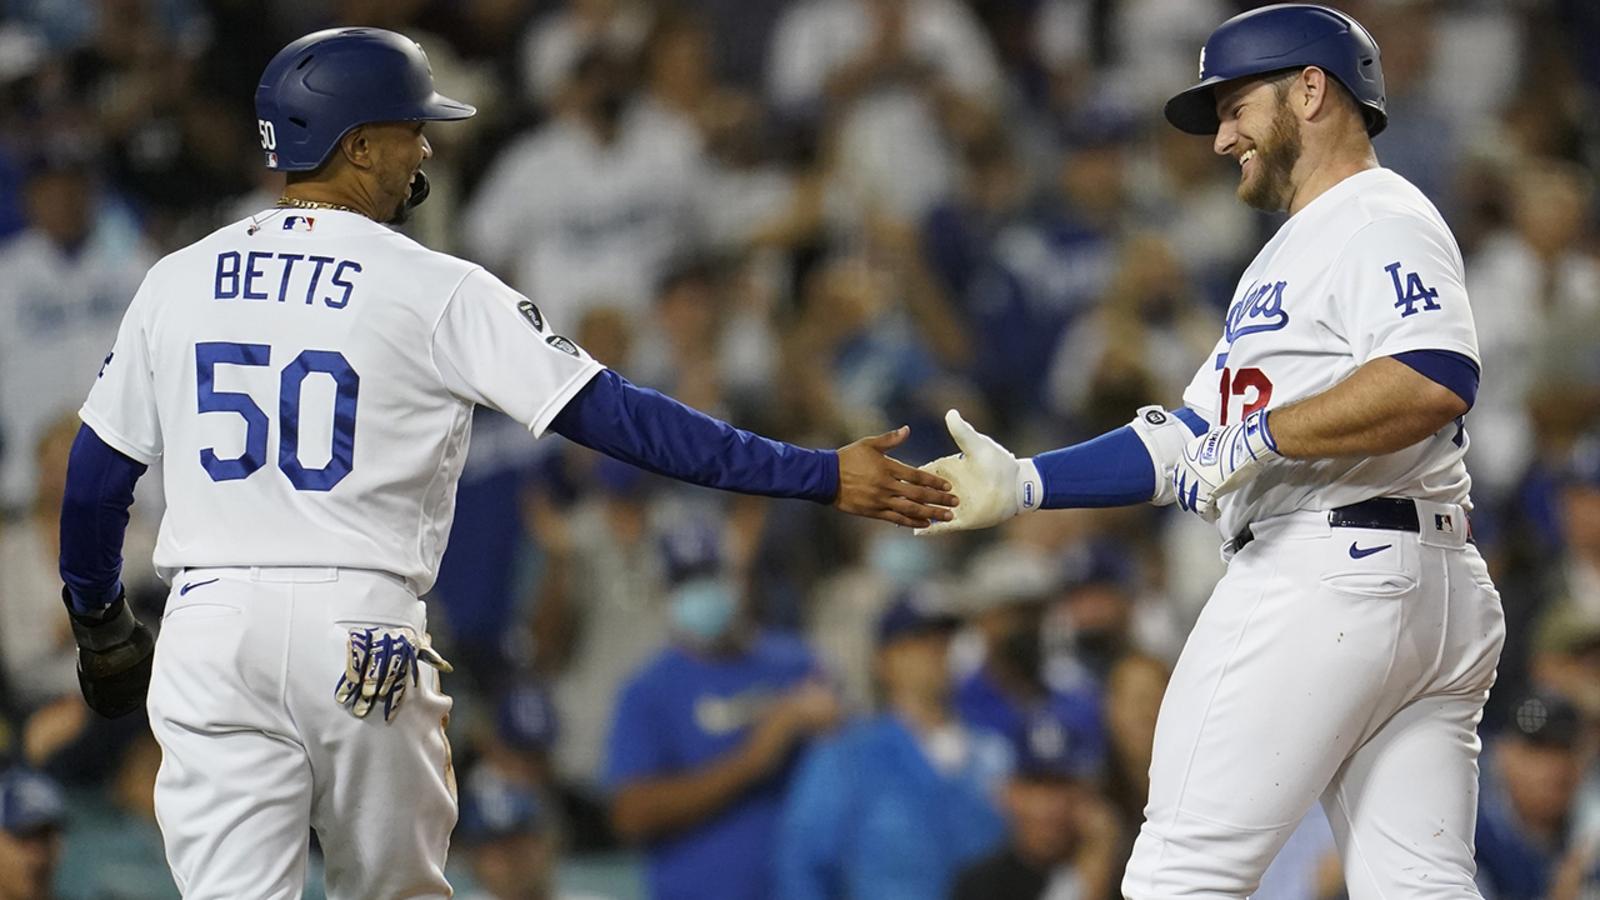 Dodgers pitcher Scherzer, Cardinals' Wainwright to meet in must-win NL wild-card game Wednesday - KABC-TV